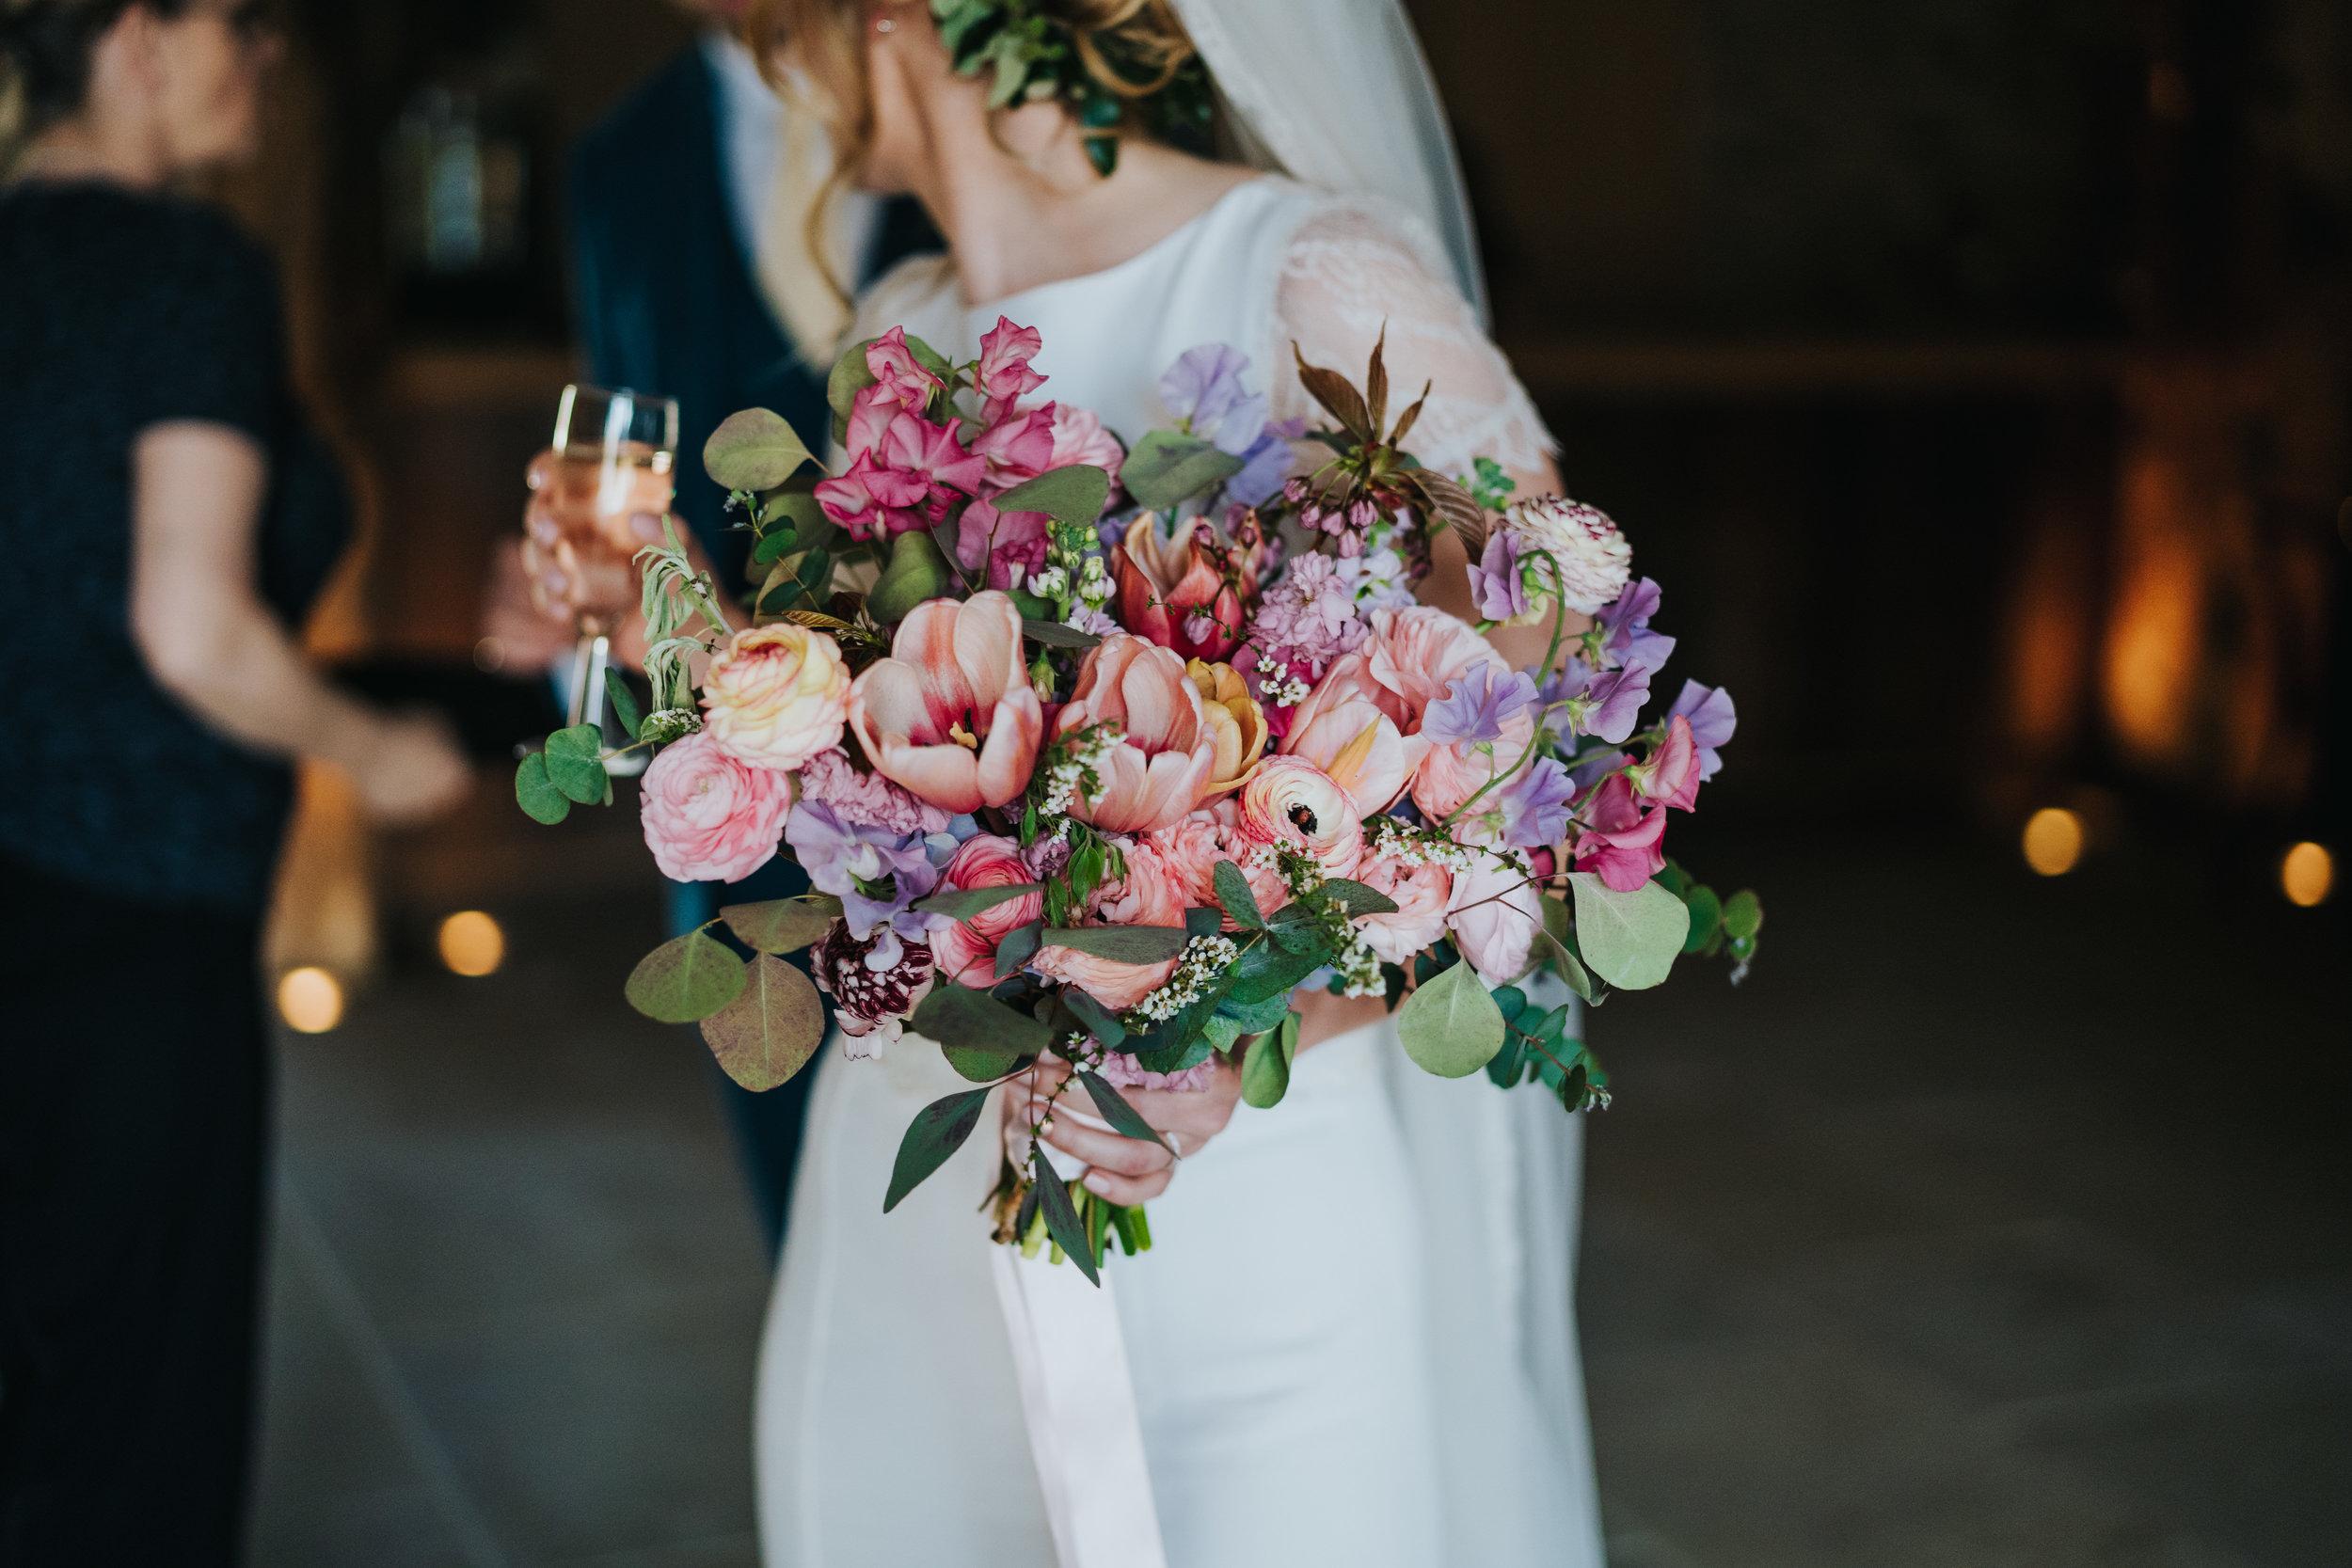 Owl House Flowers - Seasonal British flowersfor your wedding